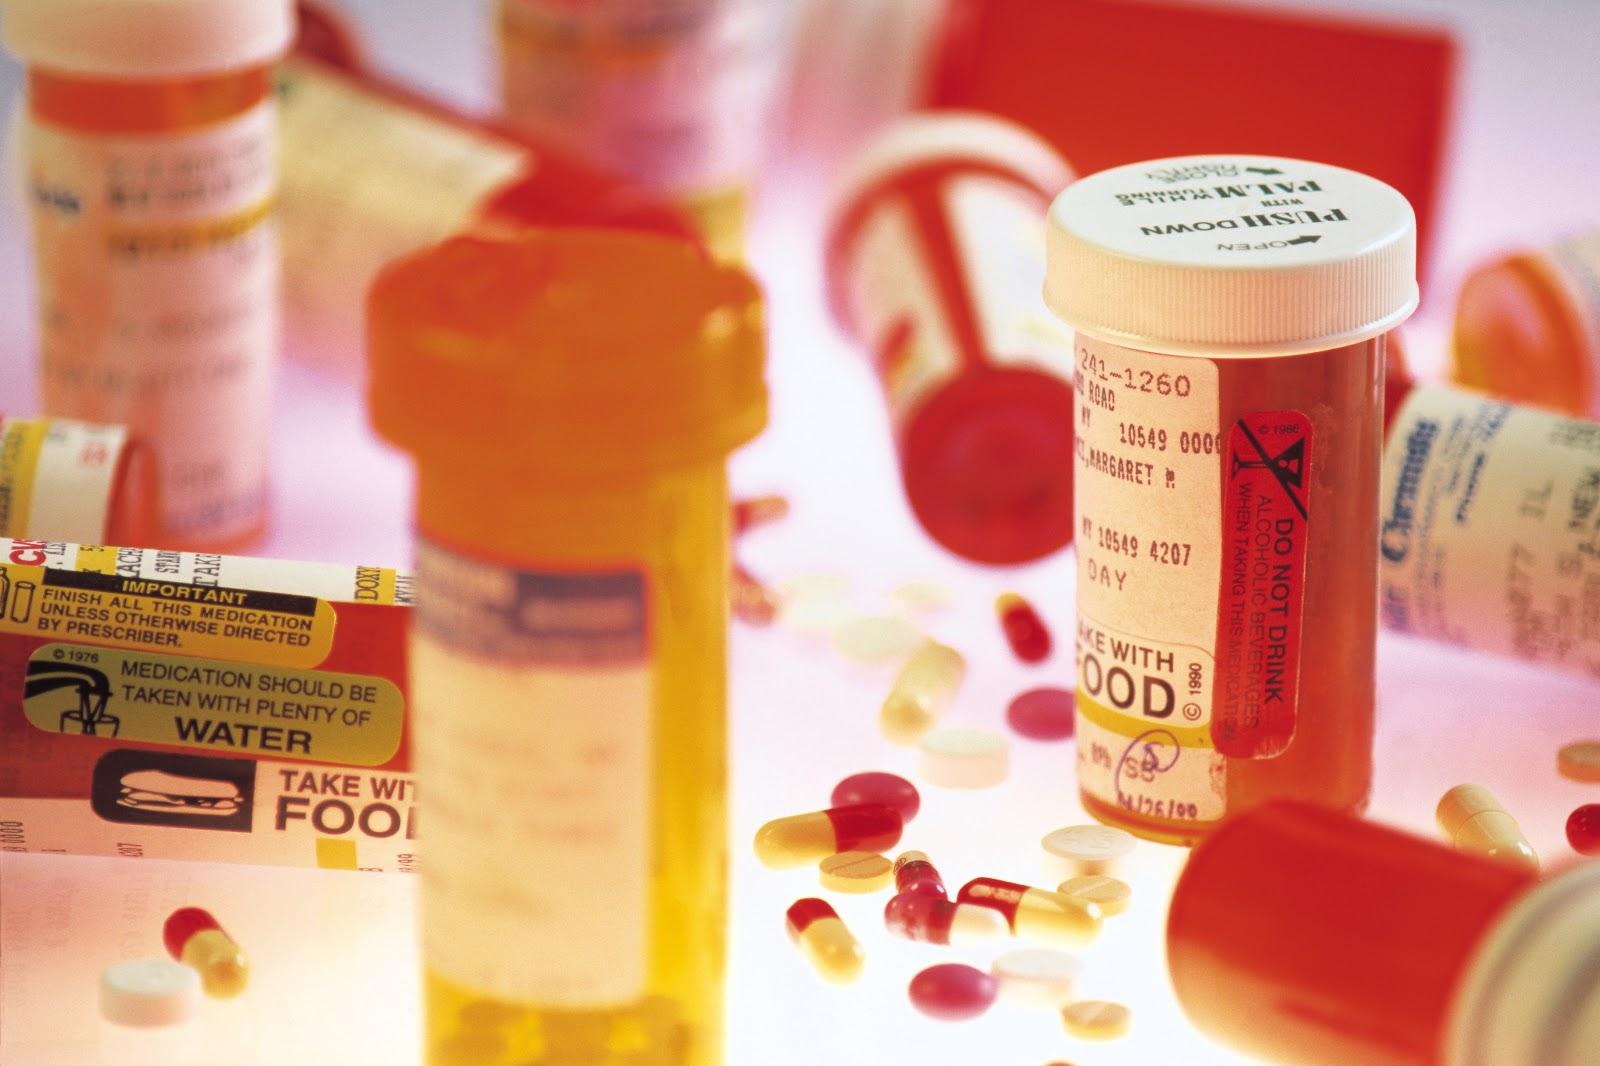 8 98 $10 90 day generic prescriptions